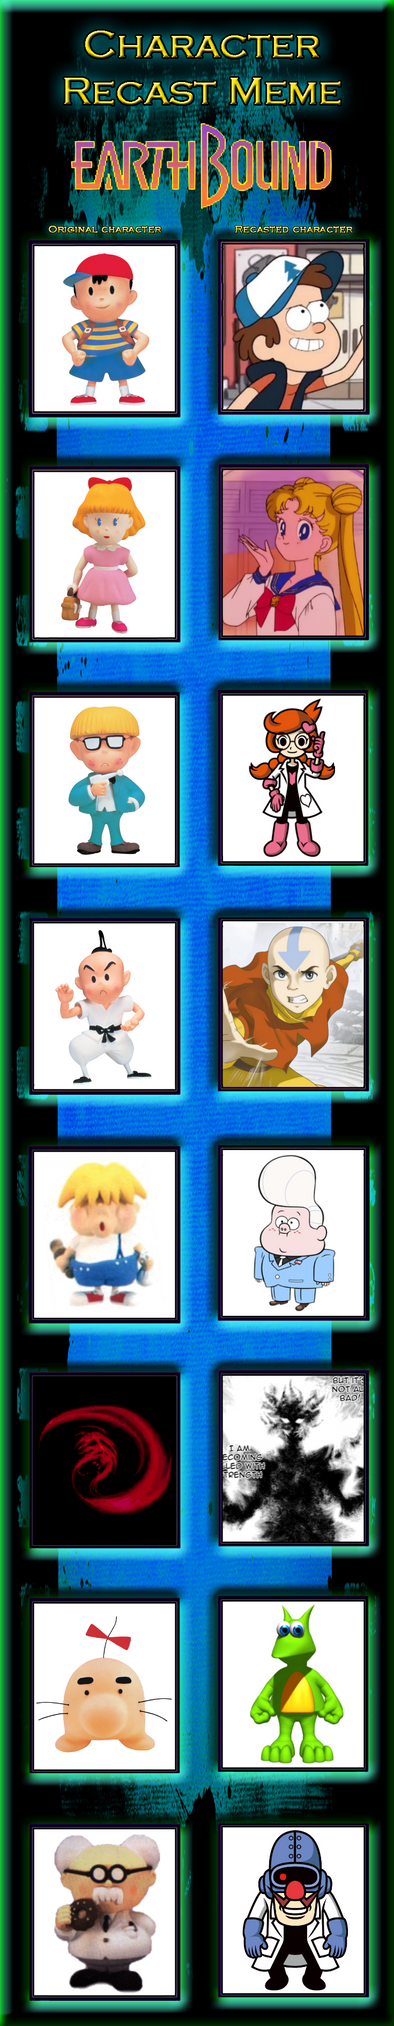 Recast Meme - EarthBound by DragonKazooie89